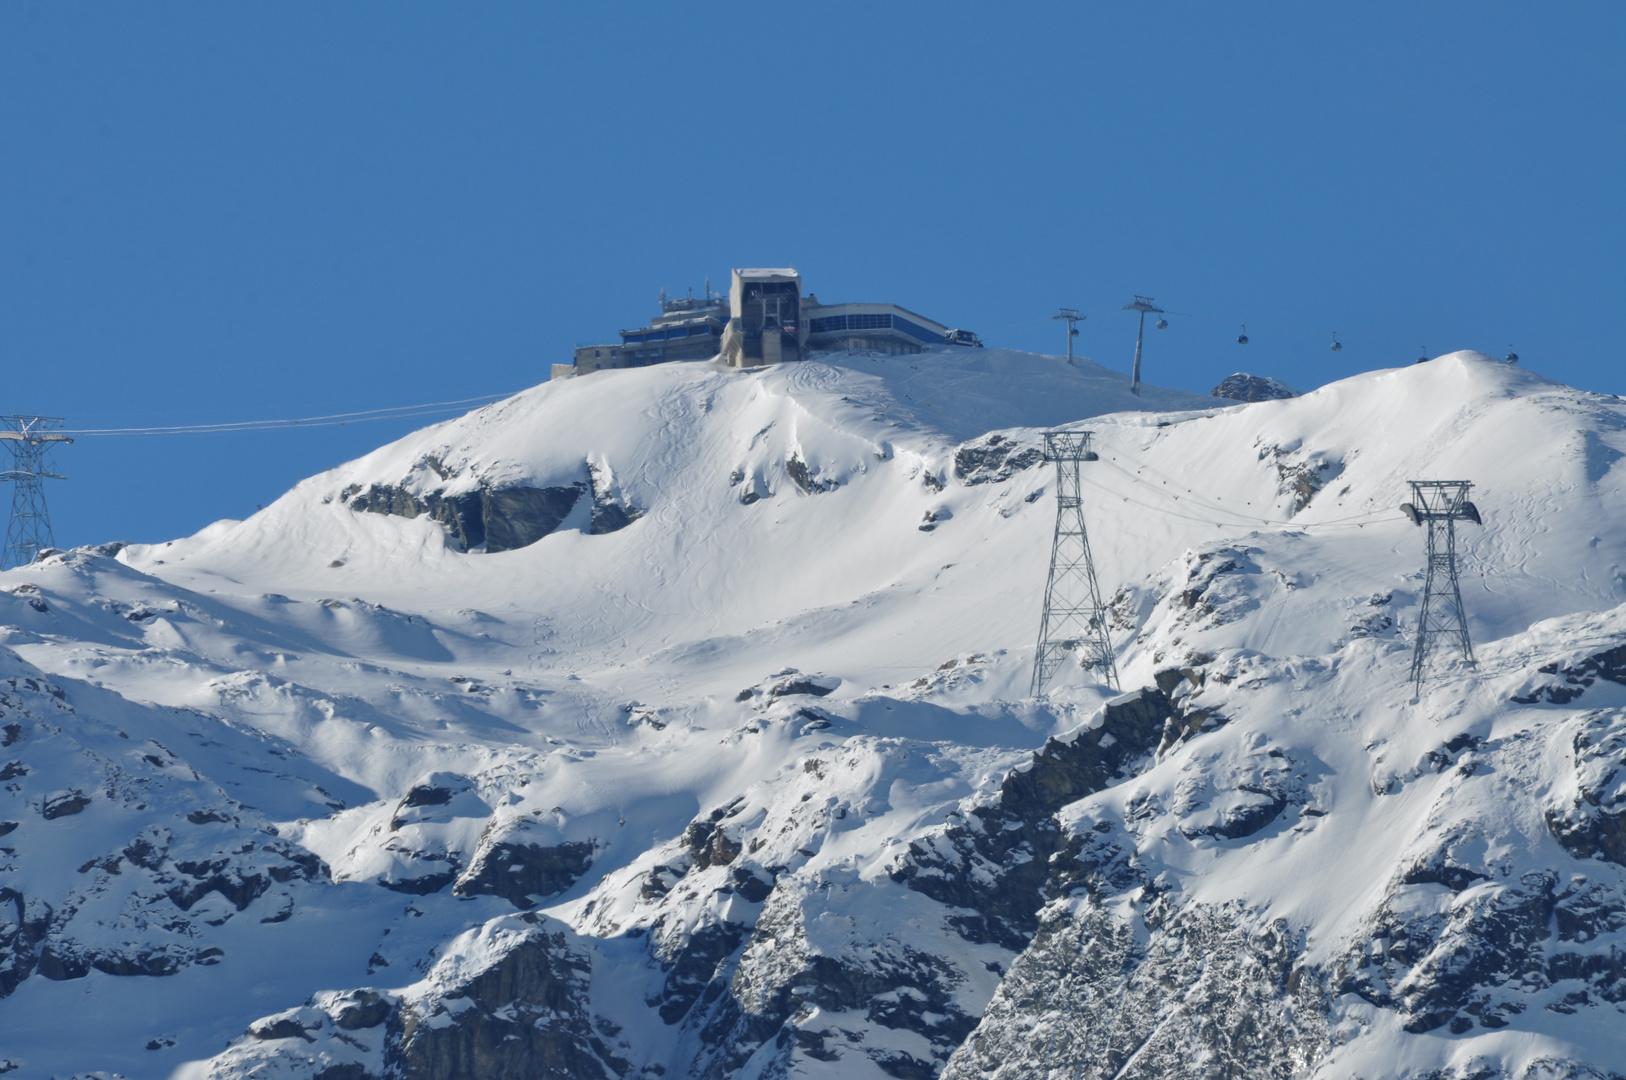 Kleines Matterhorn